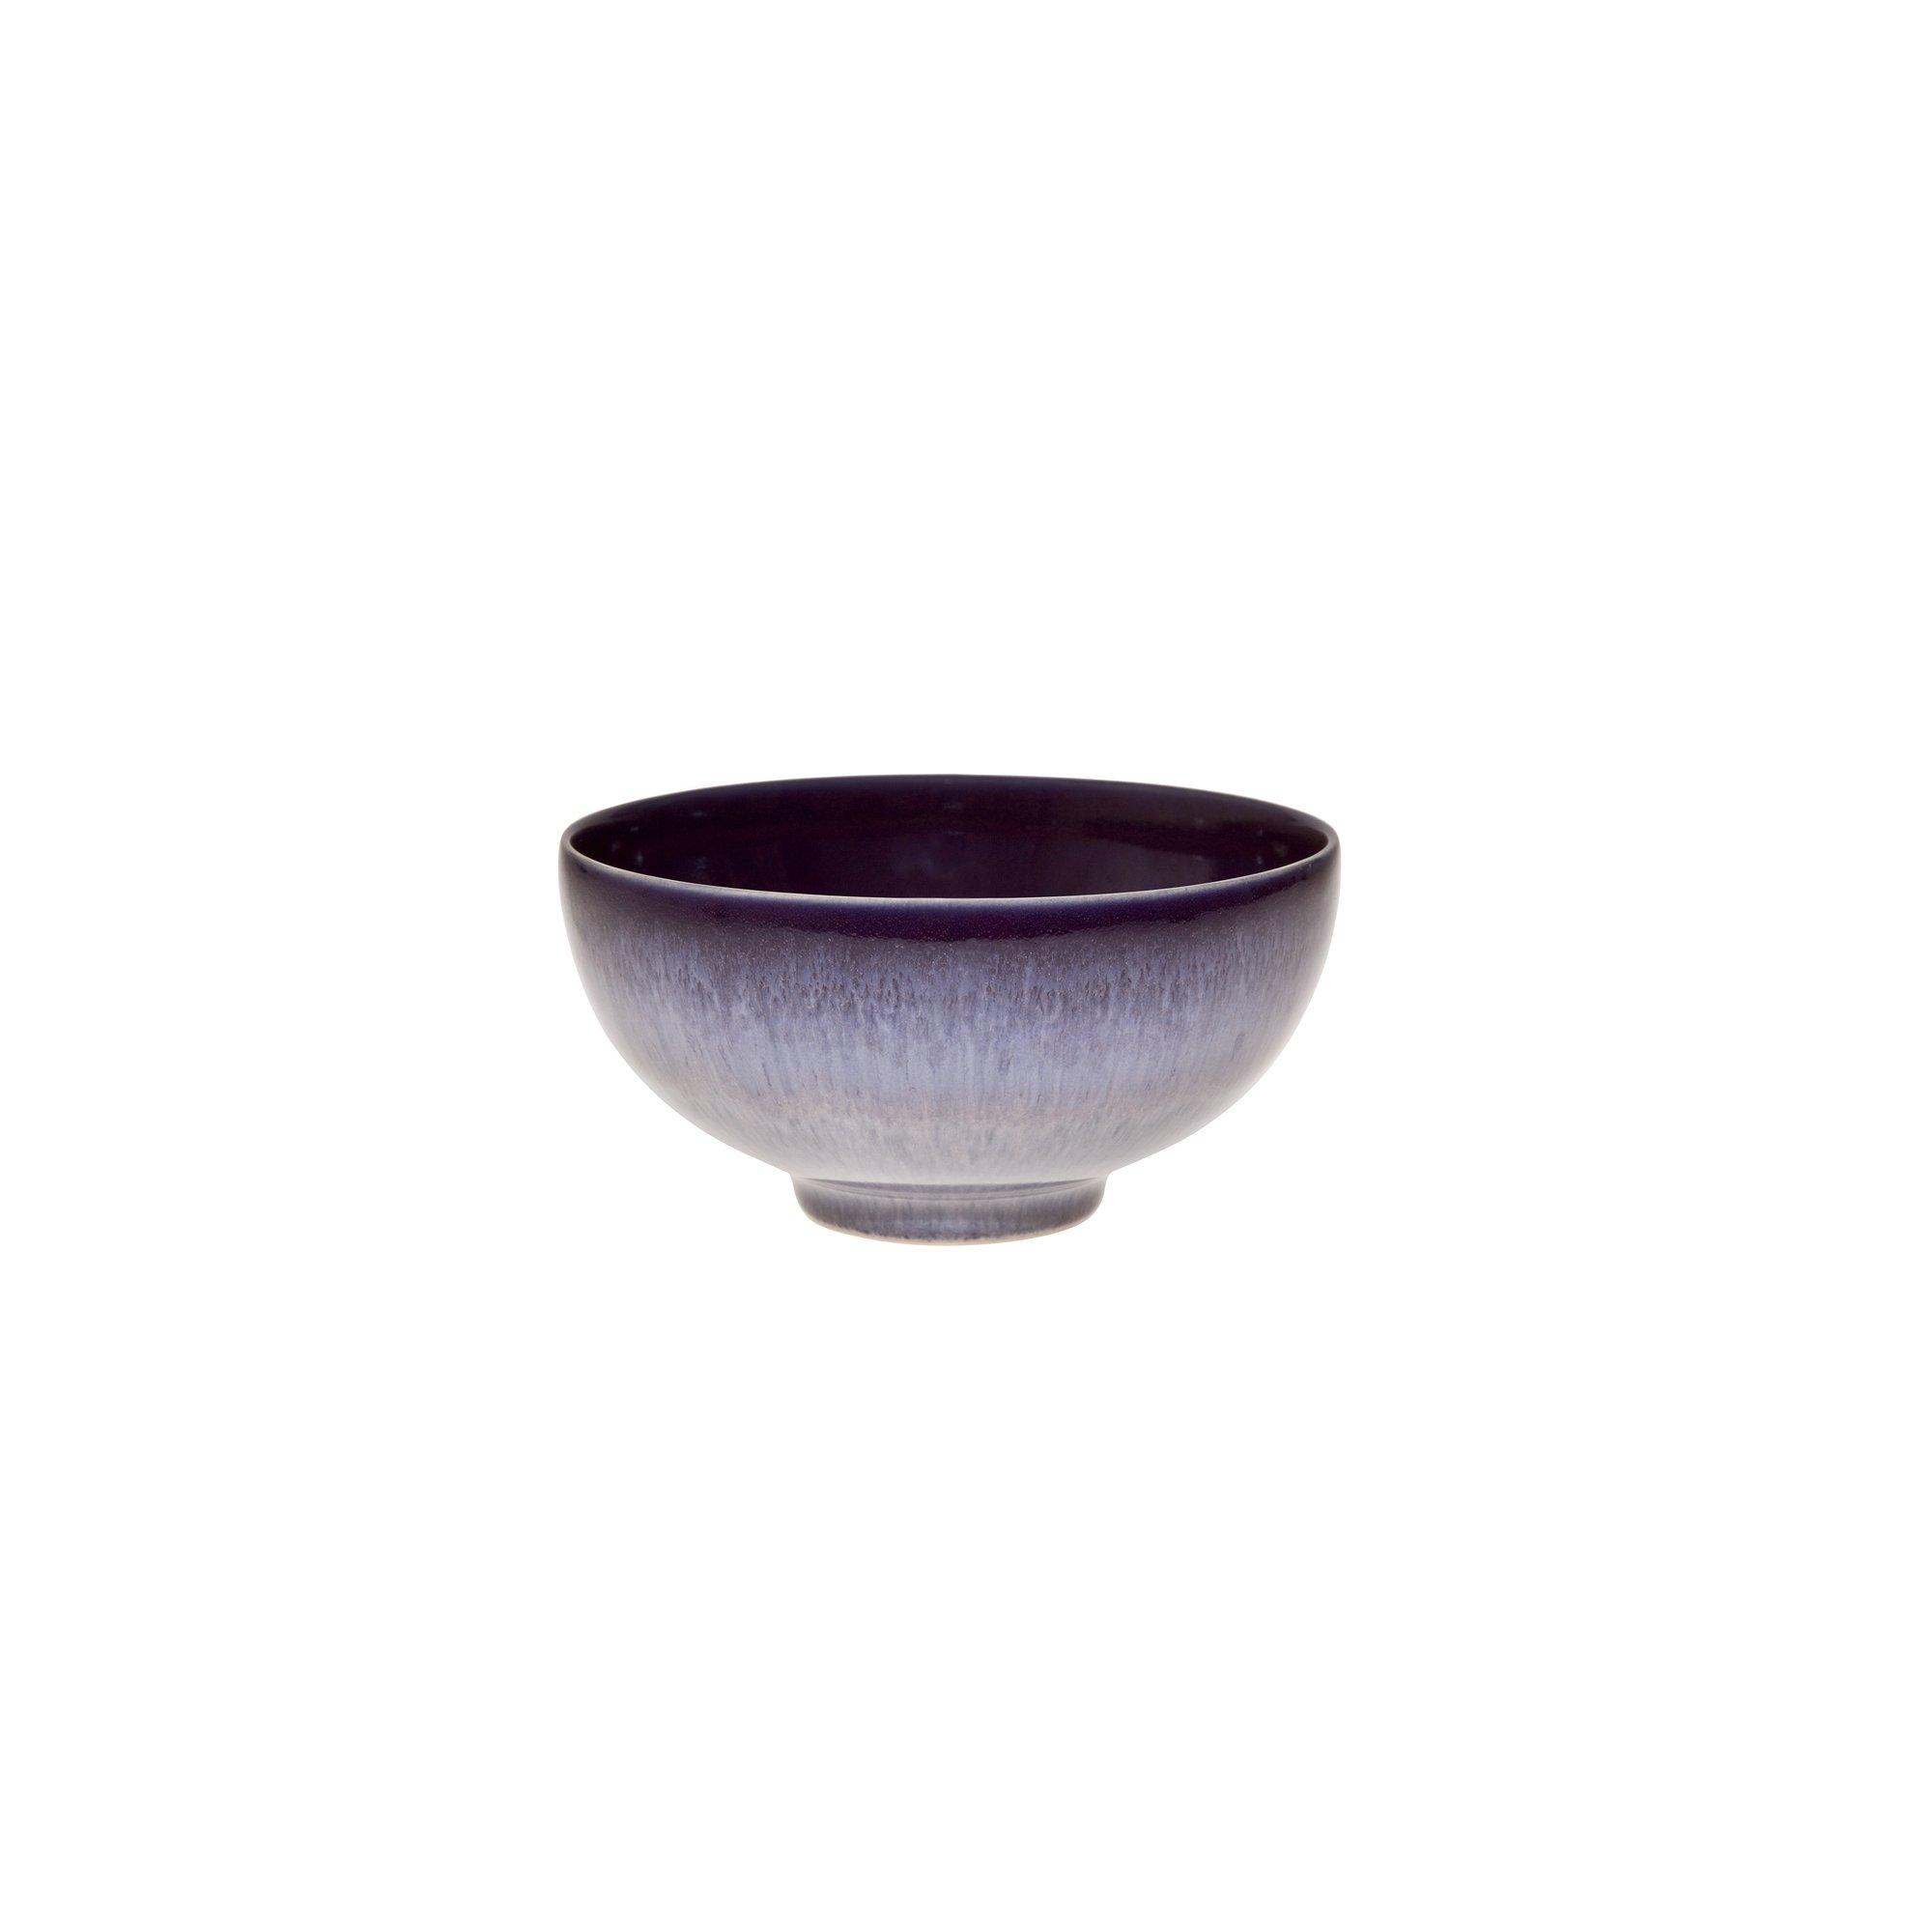 Denby HEA-209 Heather Rice Bowl, Purple, Medium